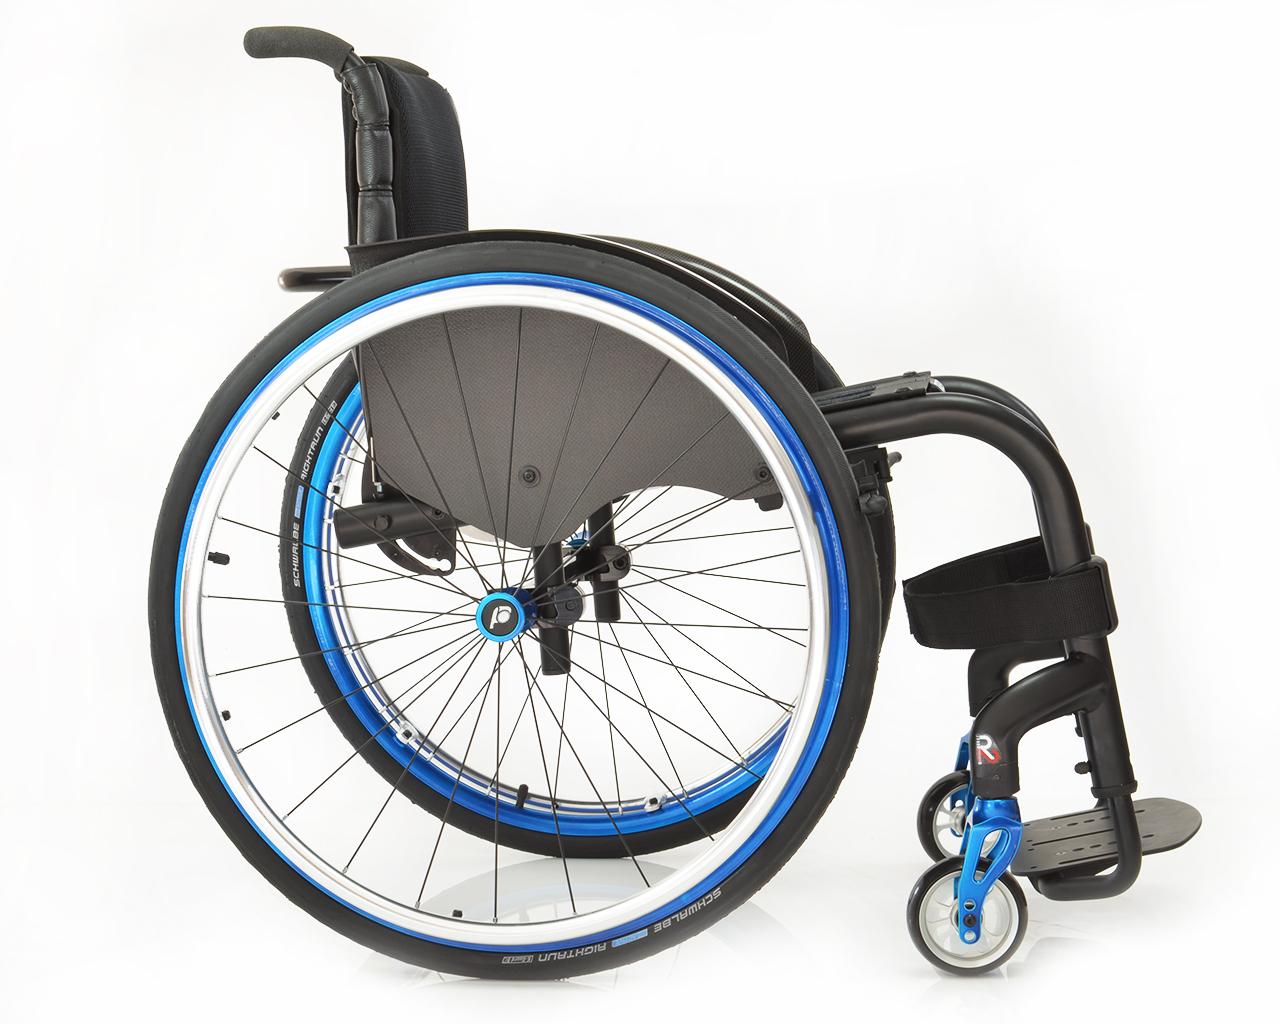 joker r2 side view active rigid wheelchair